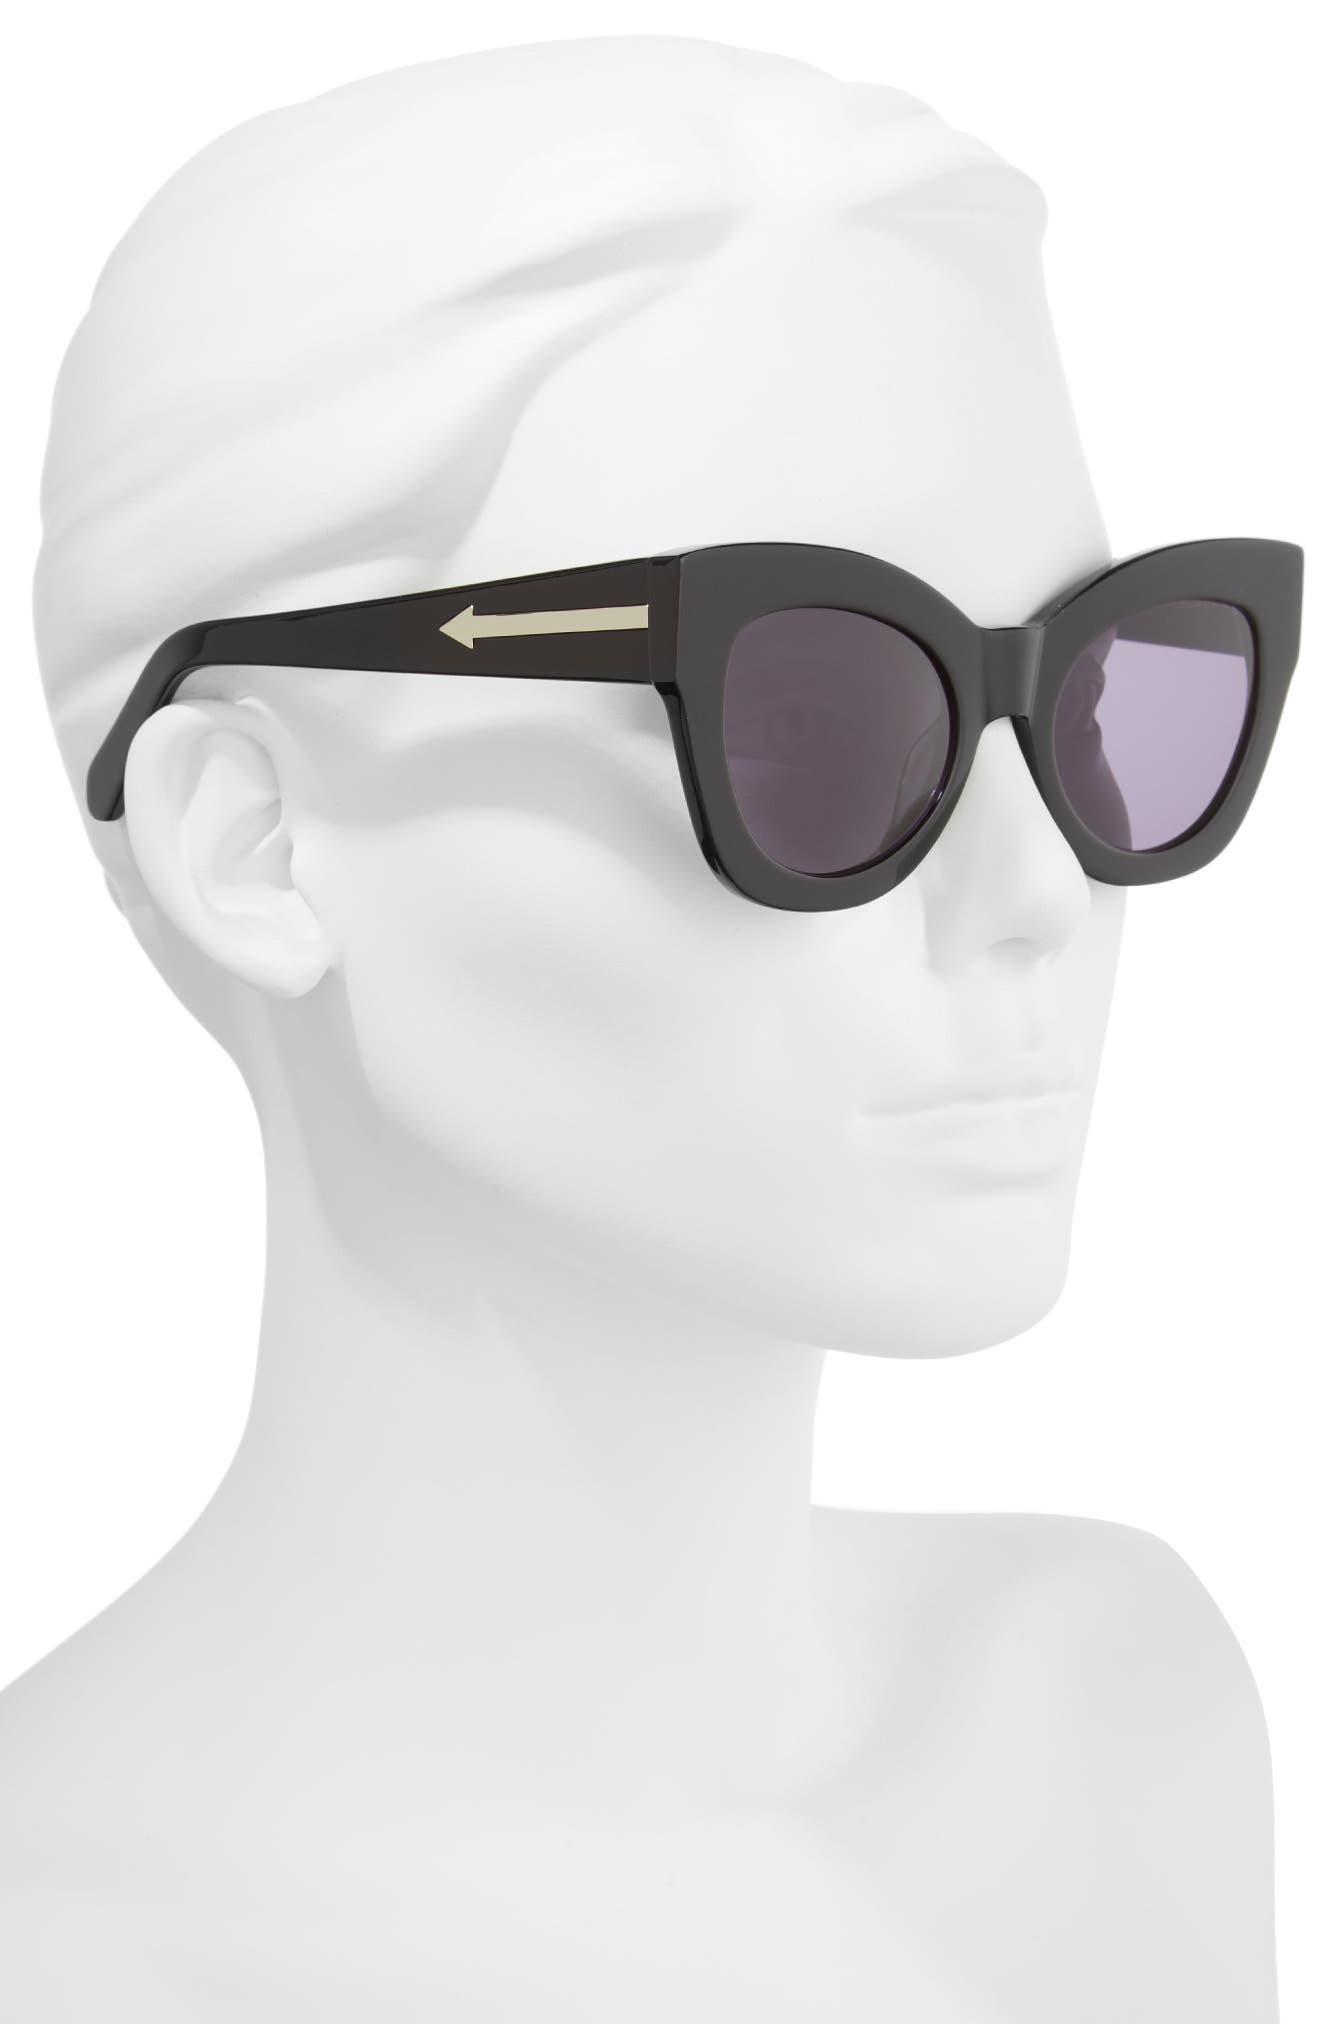 Northern Lights V2 51mm Cat Eye Sunglasses,                             Alternate thumbnail 2, color,                             001